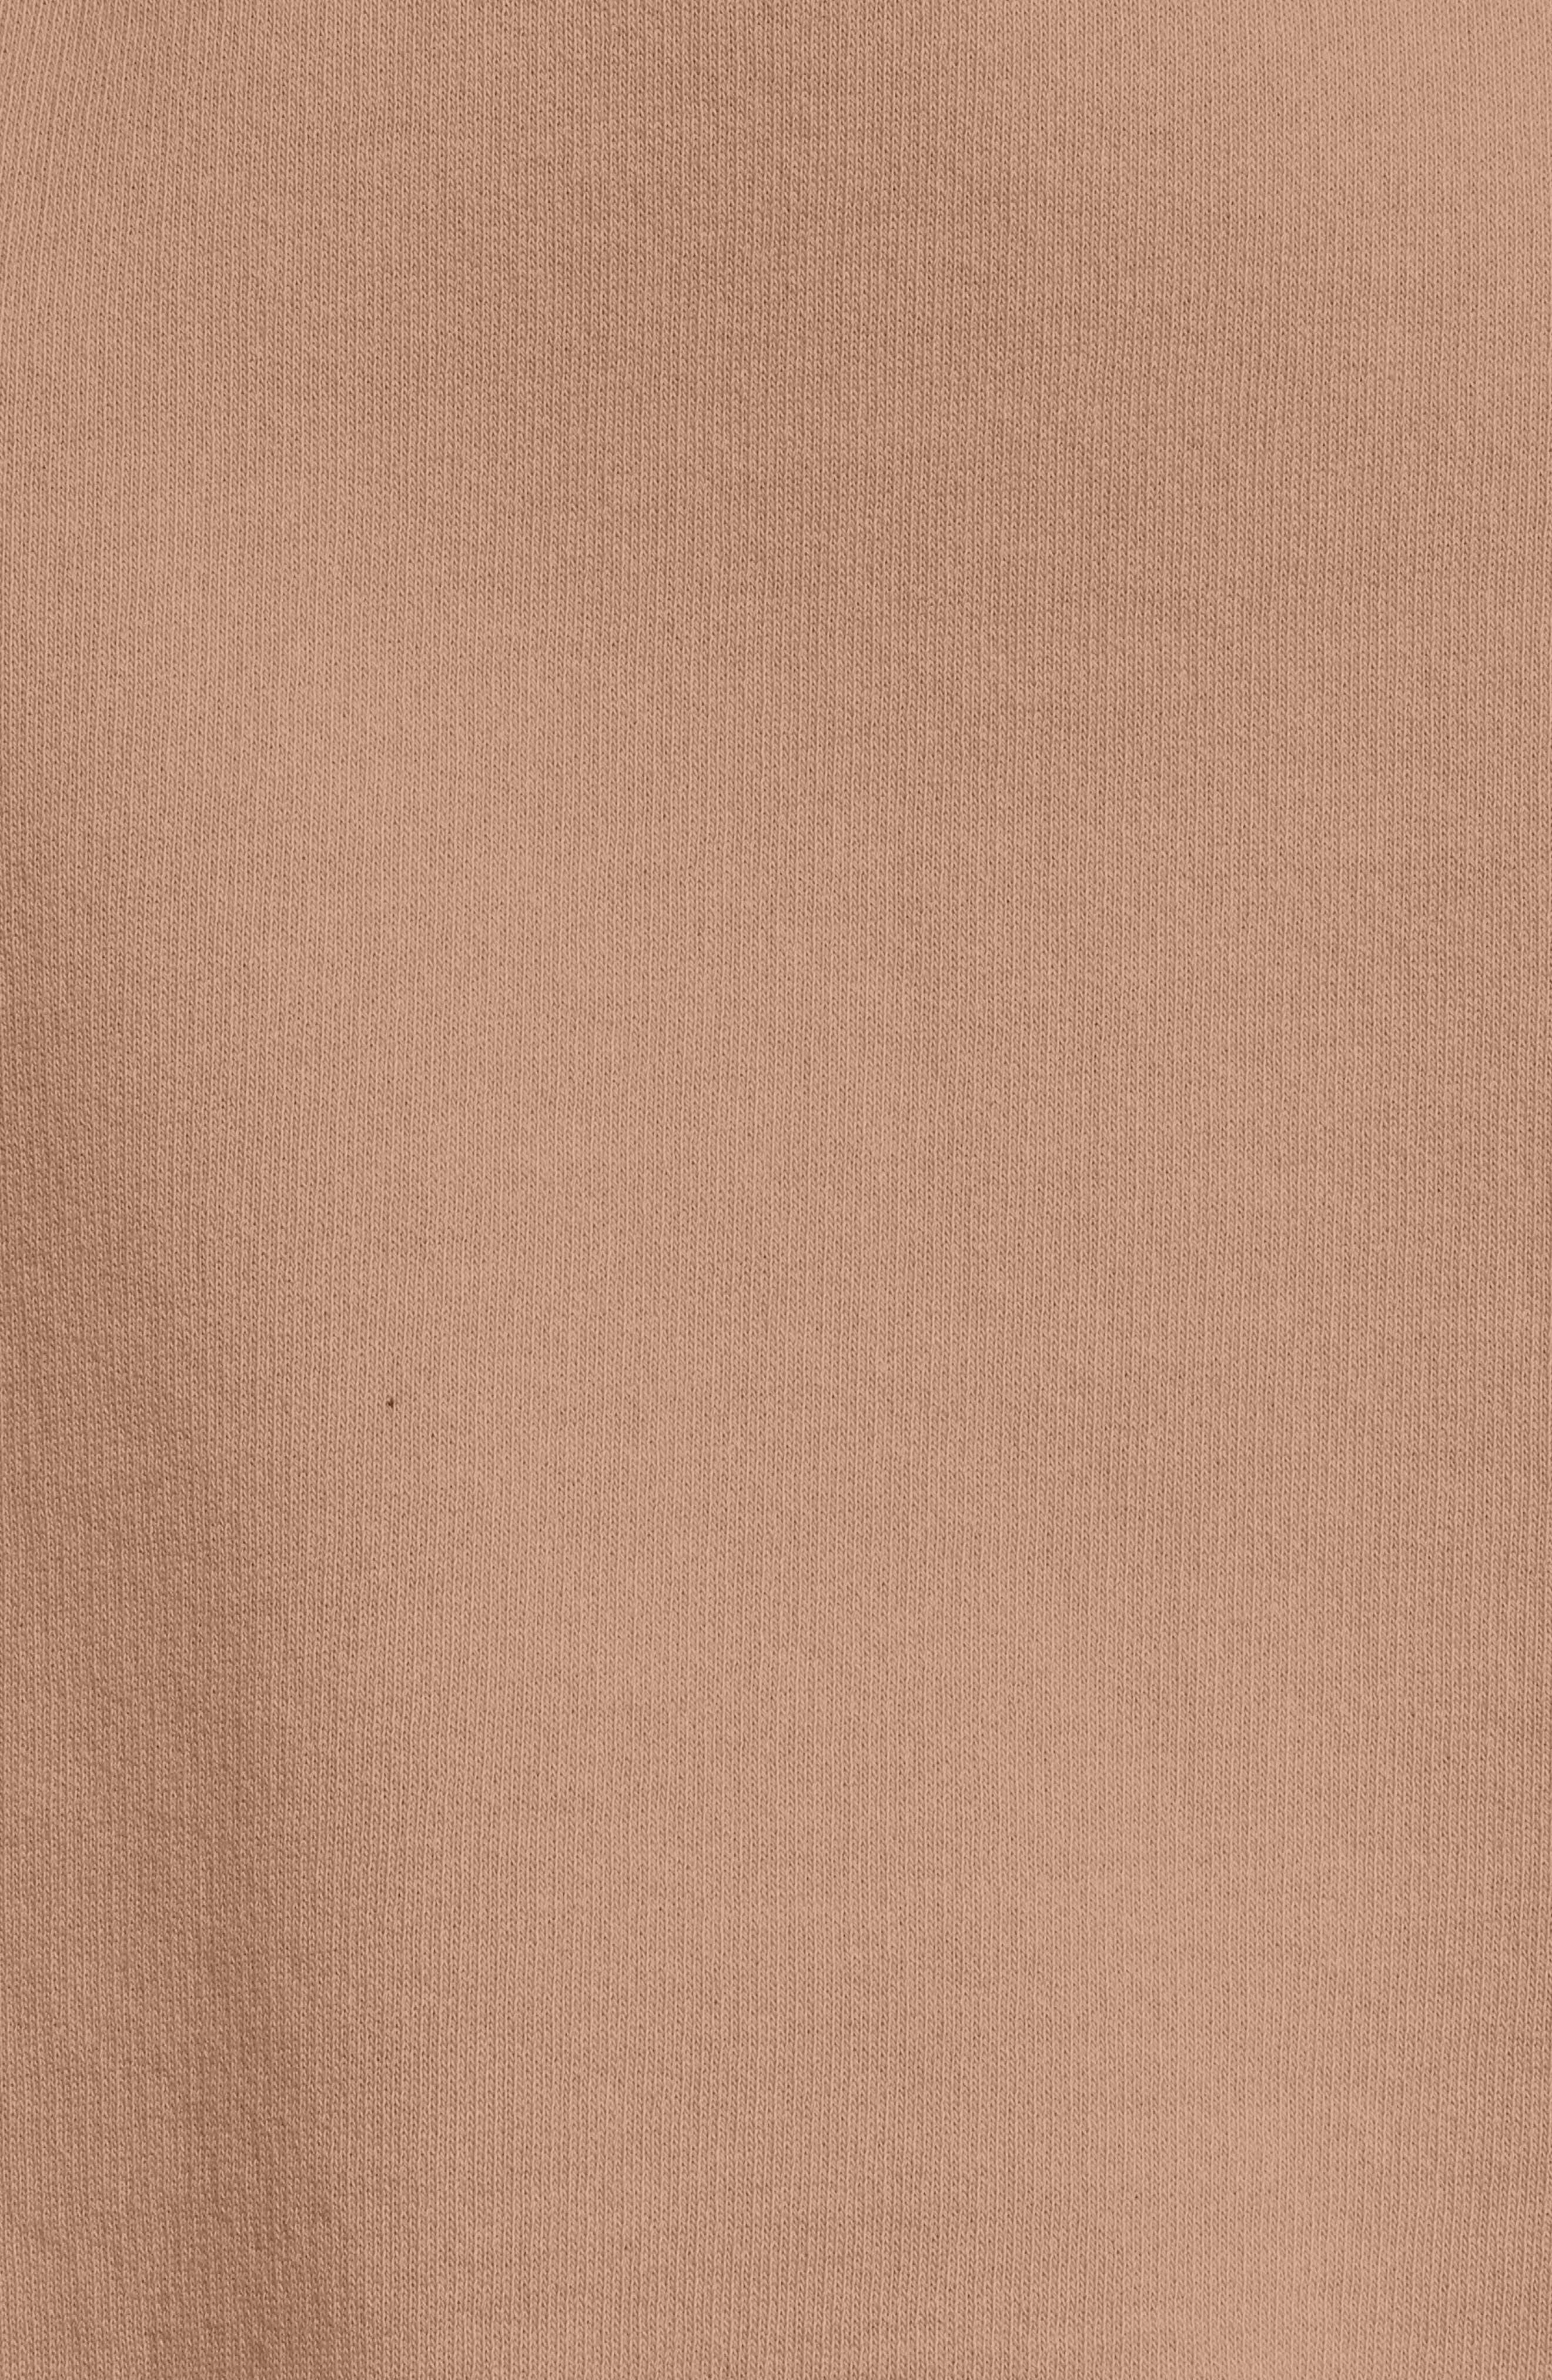 Side-Lace Sweatshirt,                             Alternate thumbnail 5, color,                             200